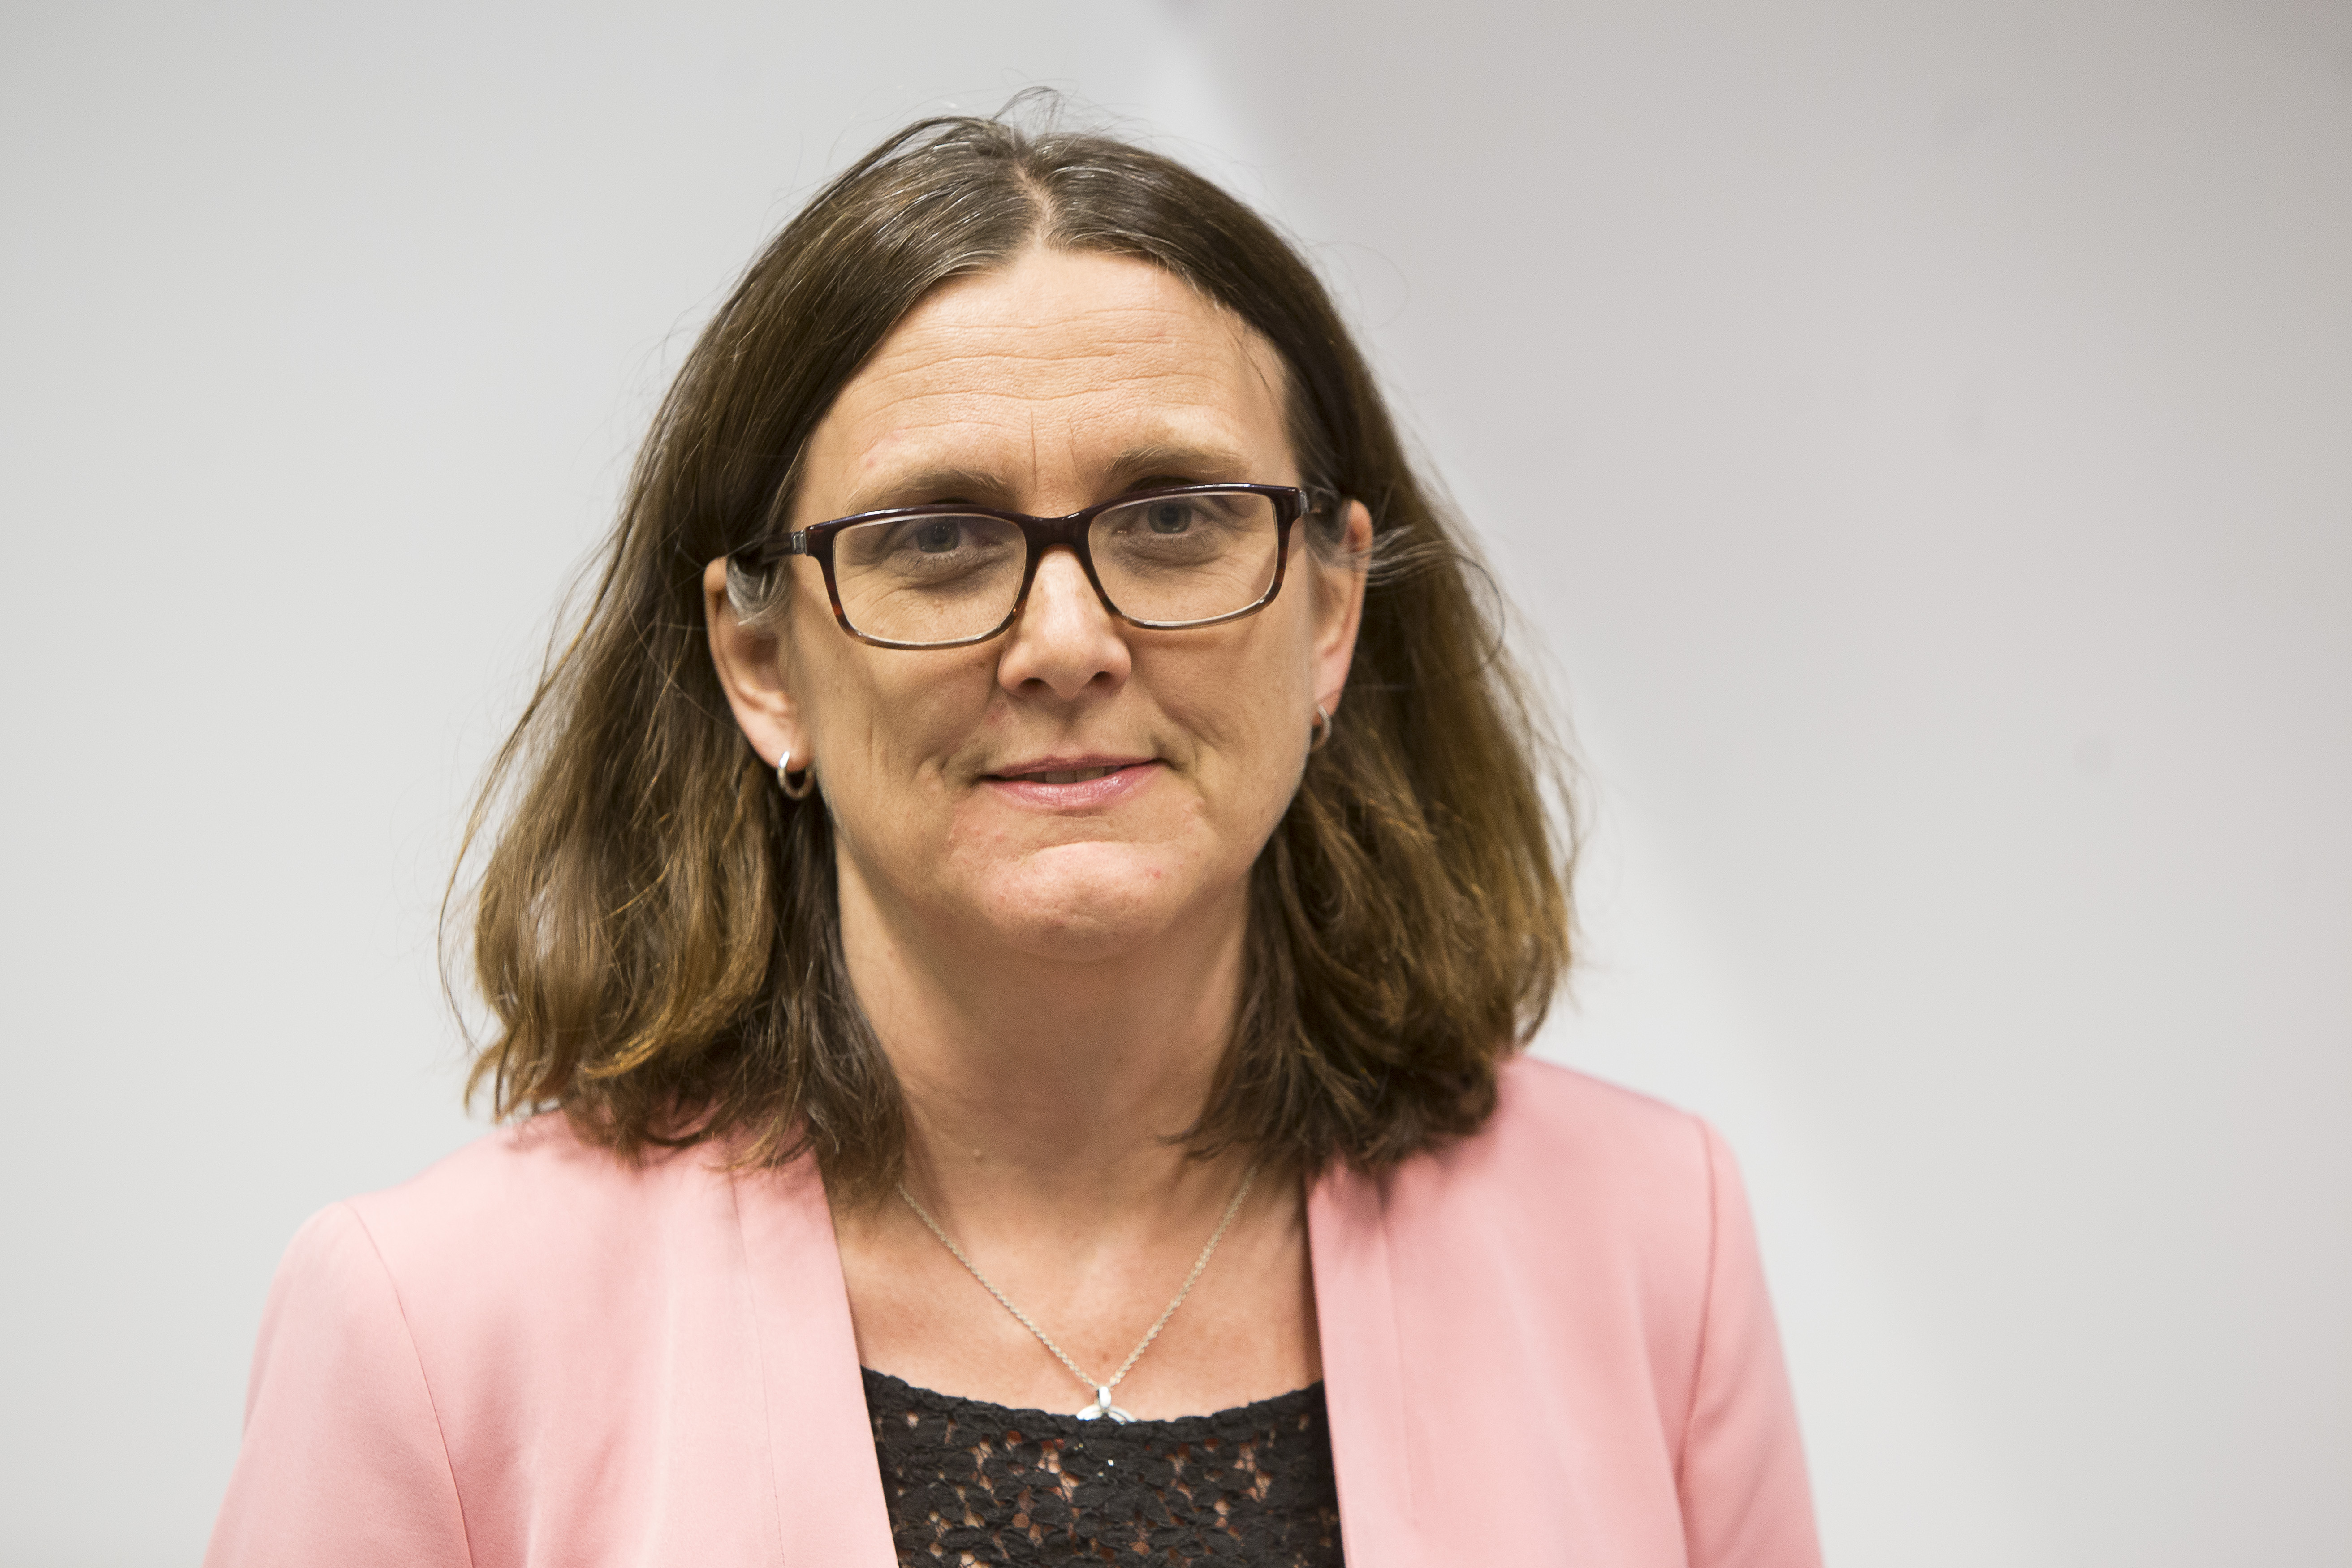 Cecilia Malmstroem, fot. PTWP